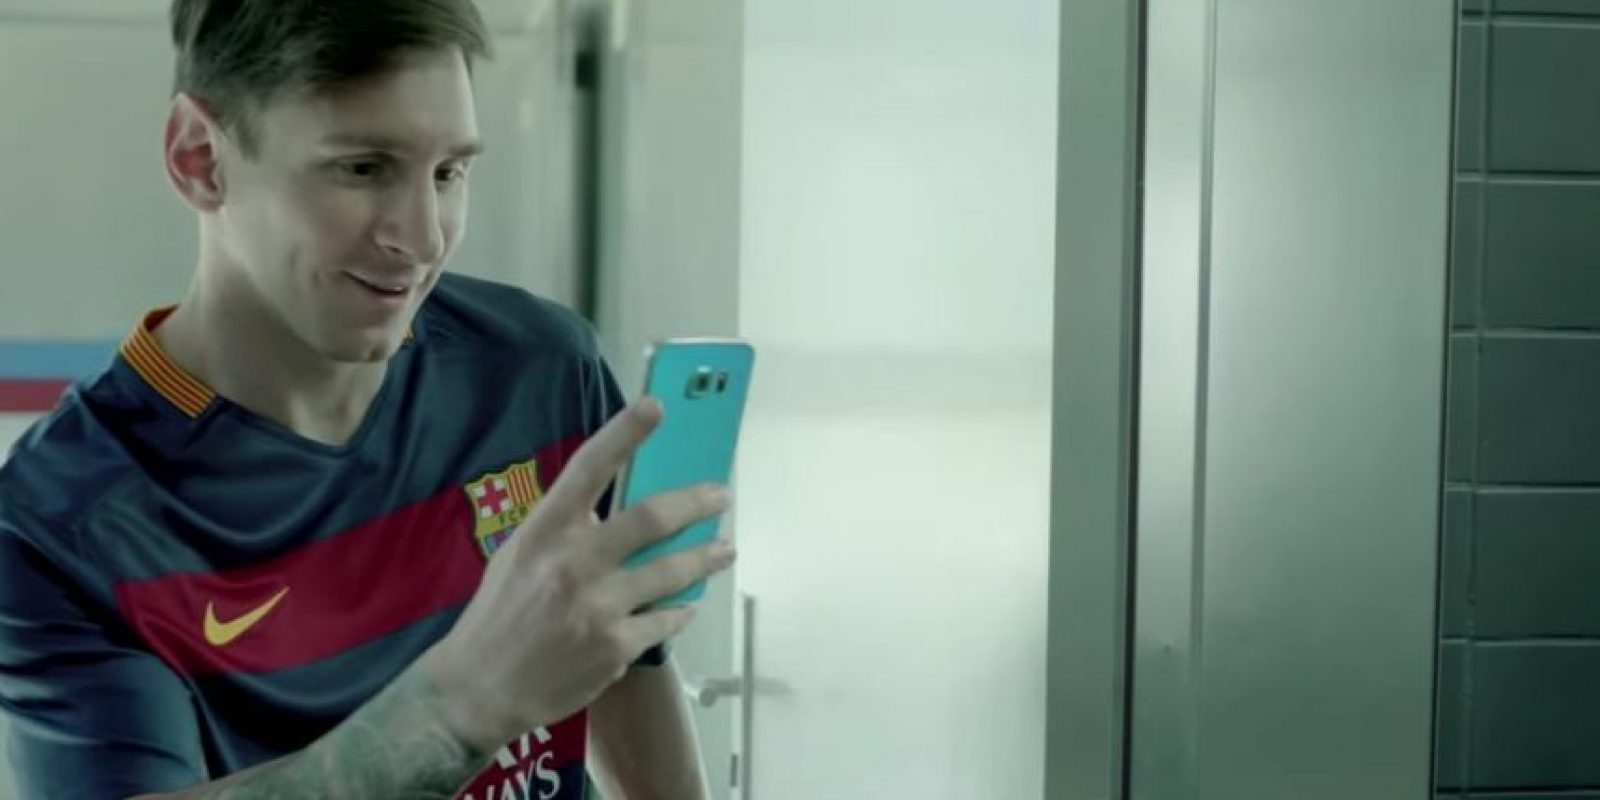 Messi grabó al brasileño mientras bailaba. Foto:FC Barcelona / YouTube